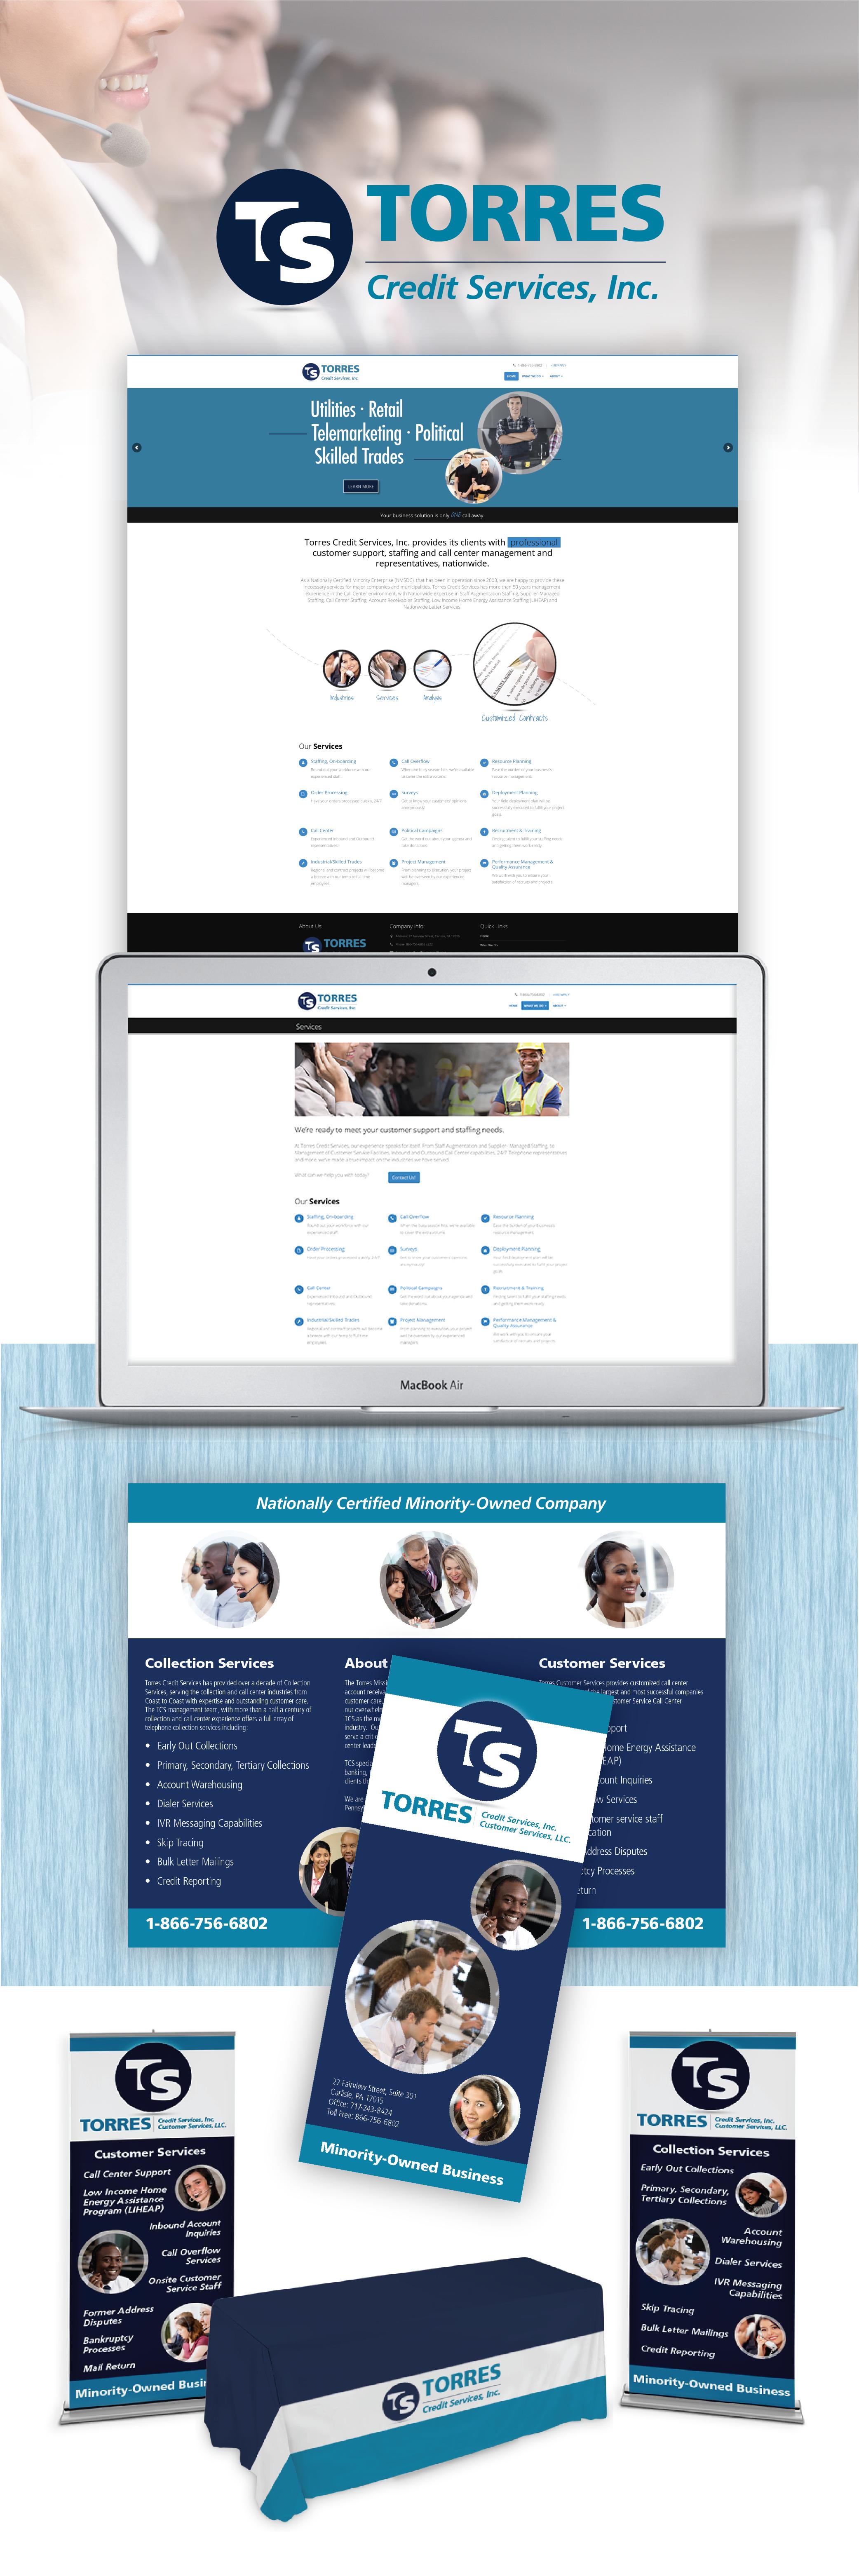 Torres Credit Services